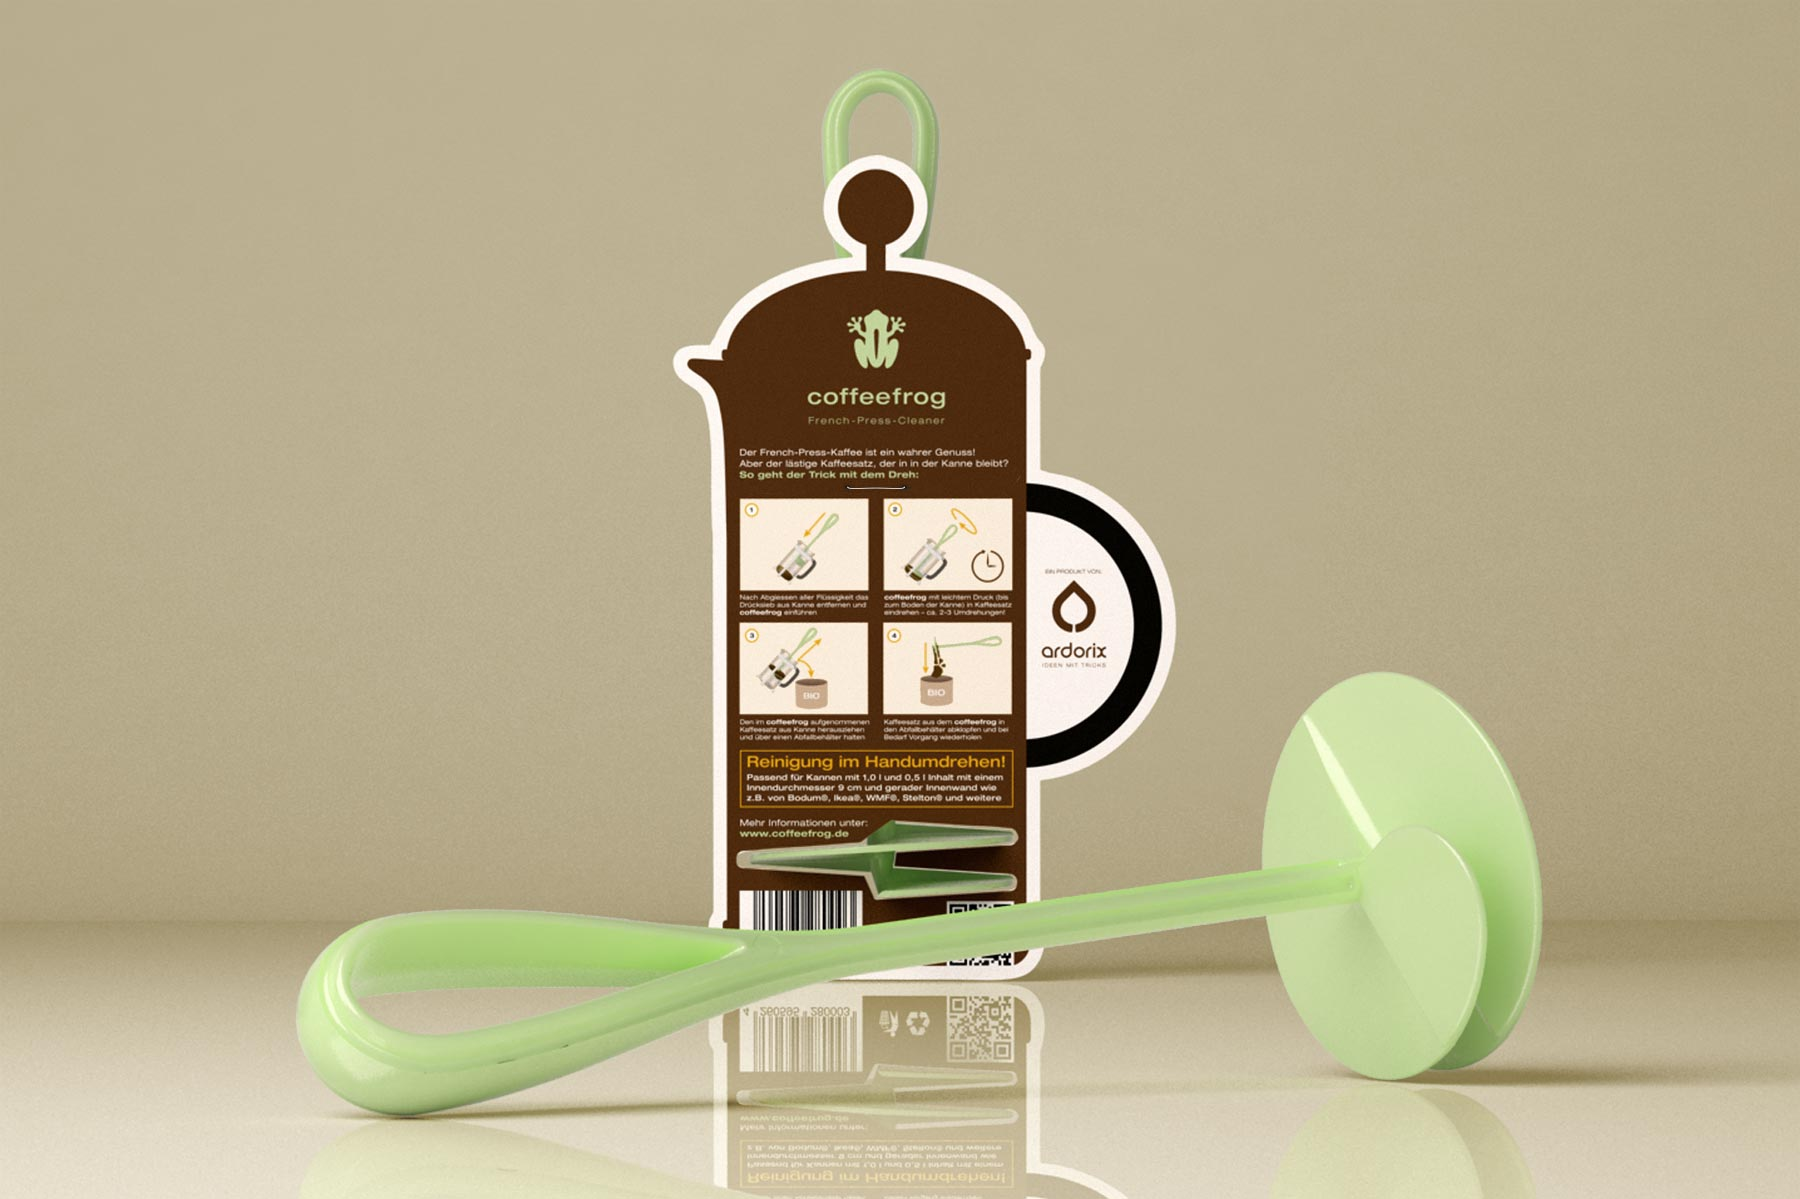 Coffeefrog, Produktverpackung, Packaging, Verpackungsdesign, Rückseite